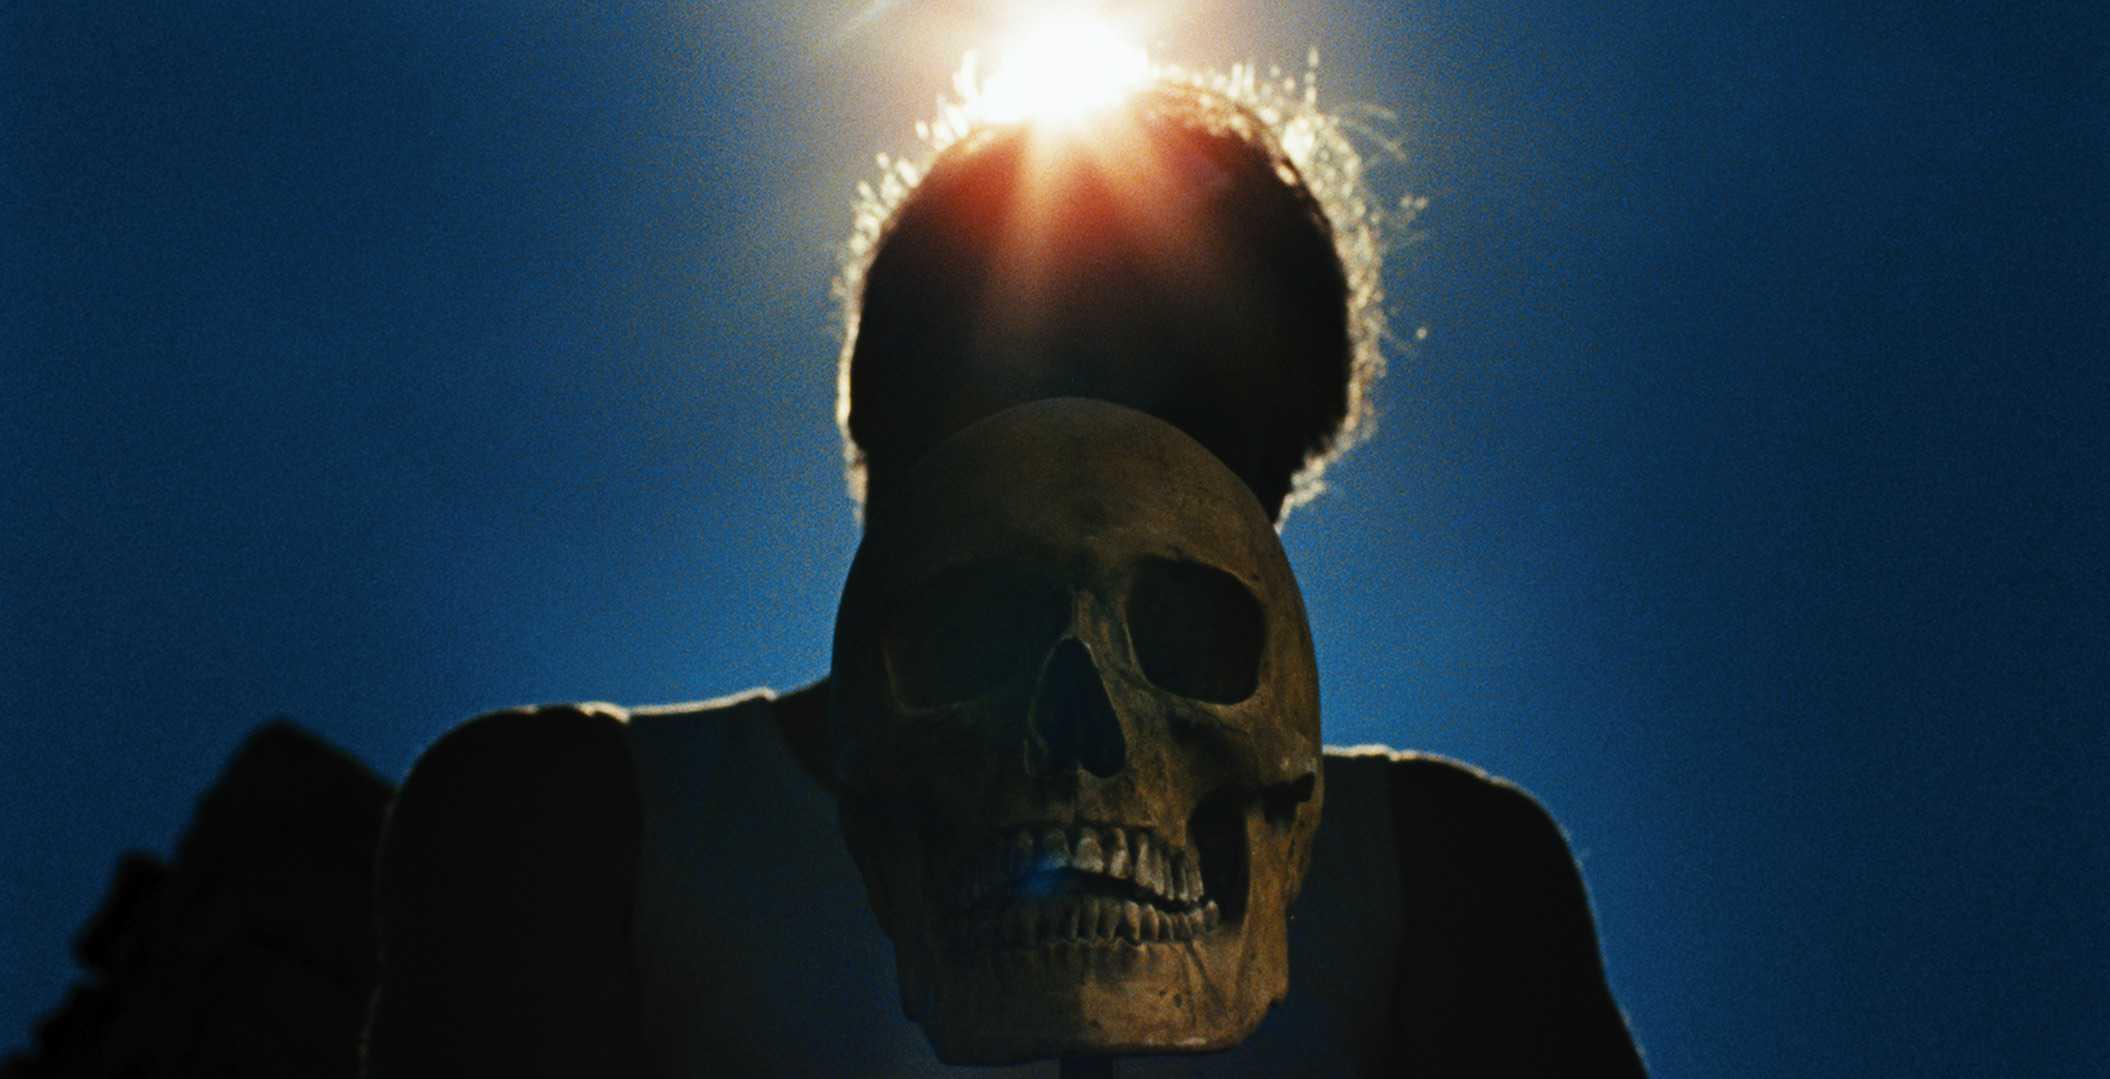 Laissez bronzer les cadavres - immagine dal film